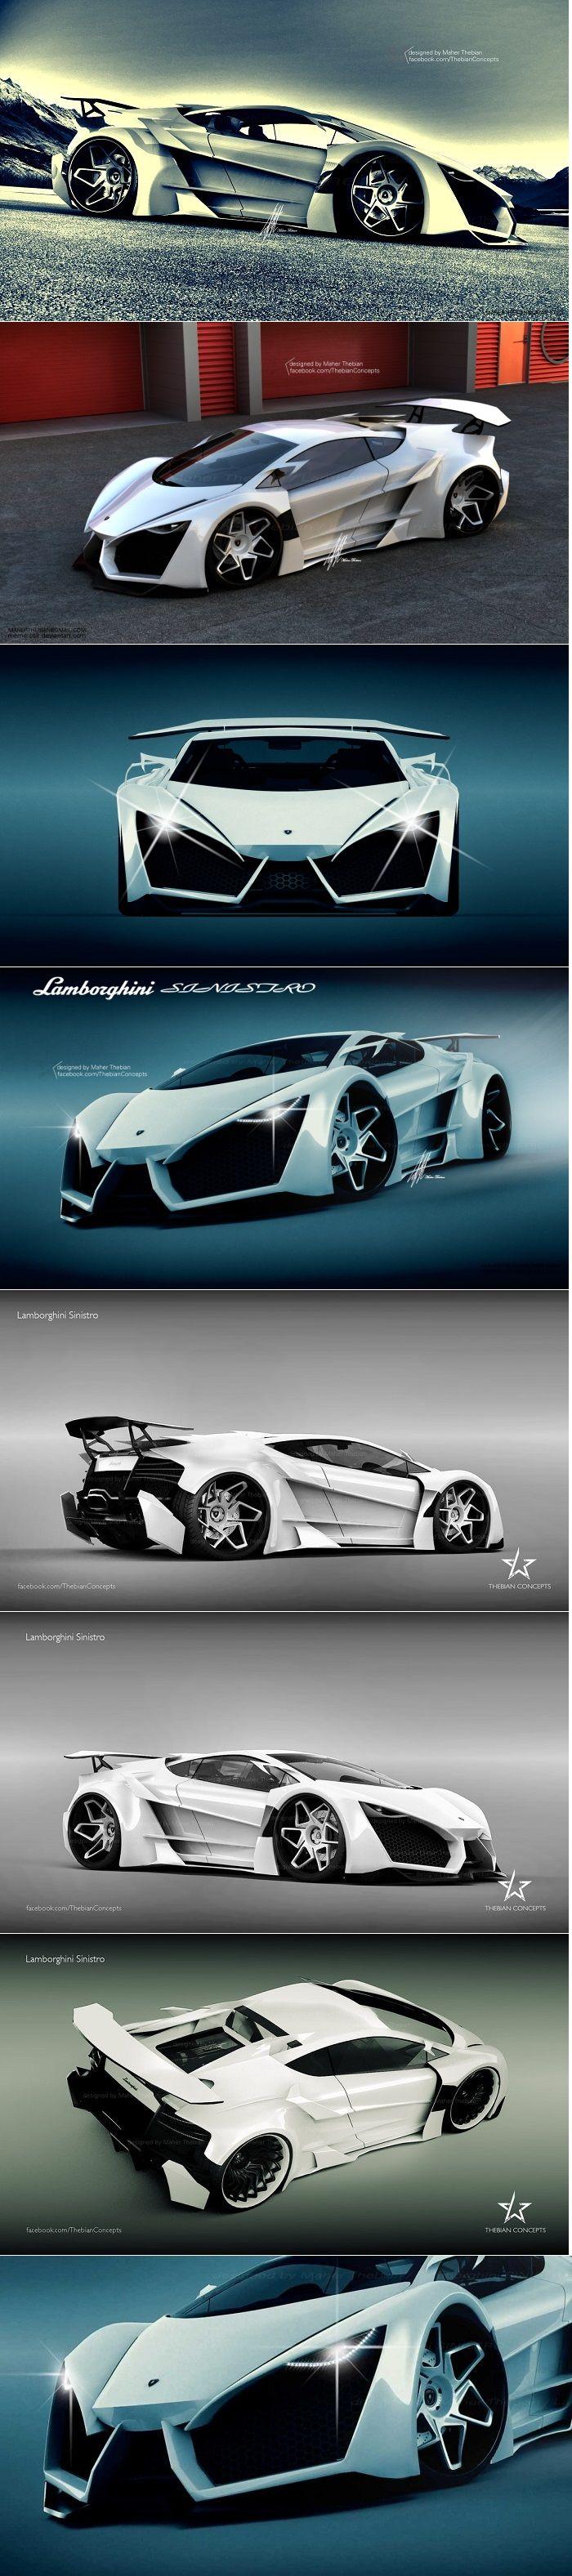 Lamborghini Sinistro concept         Found on -http://wonderpiel.com/